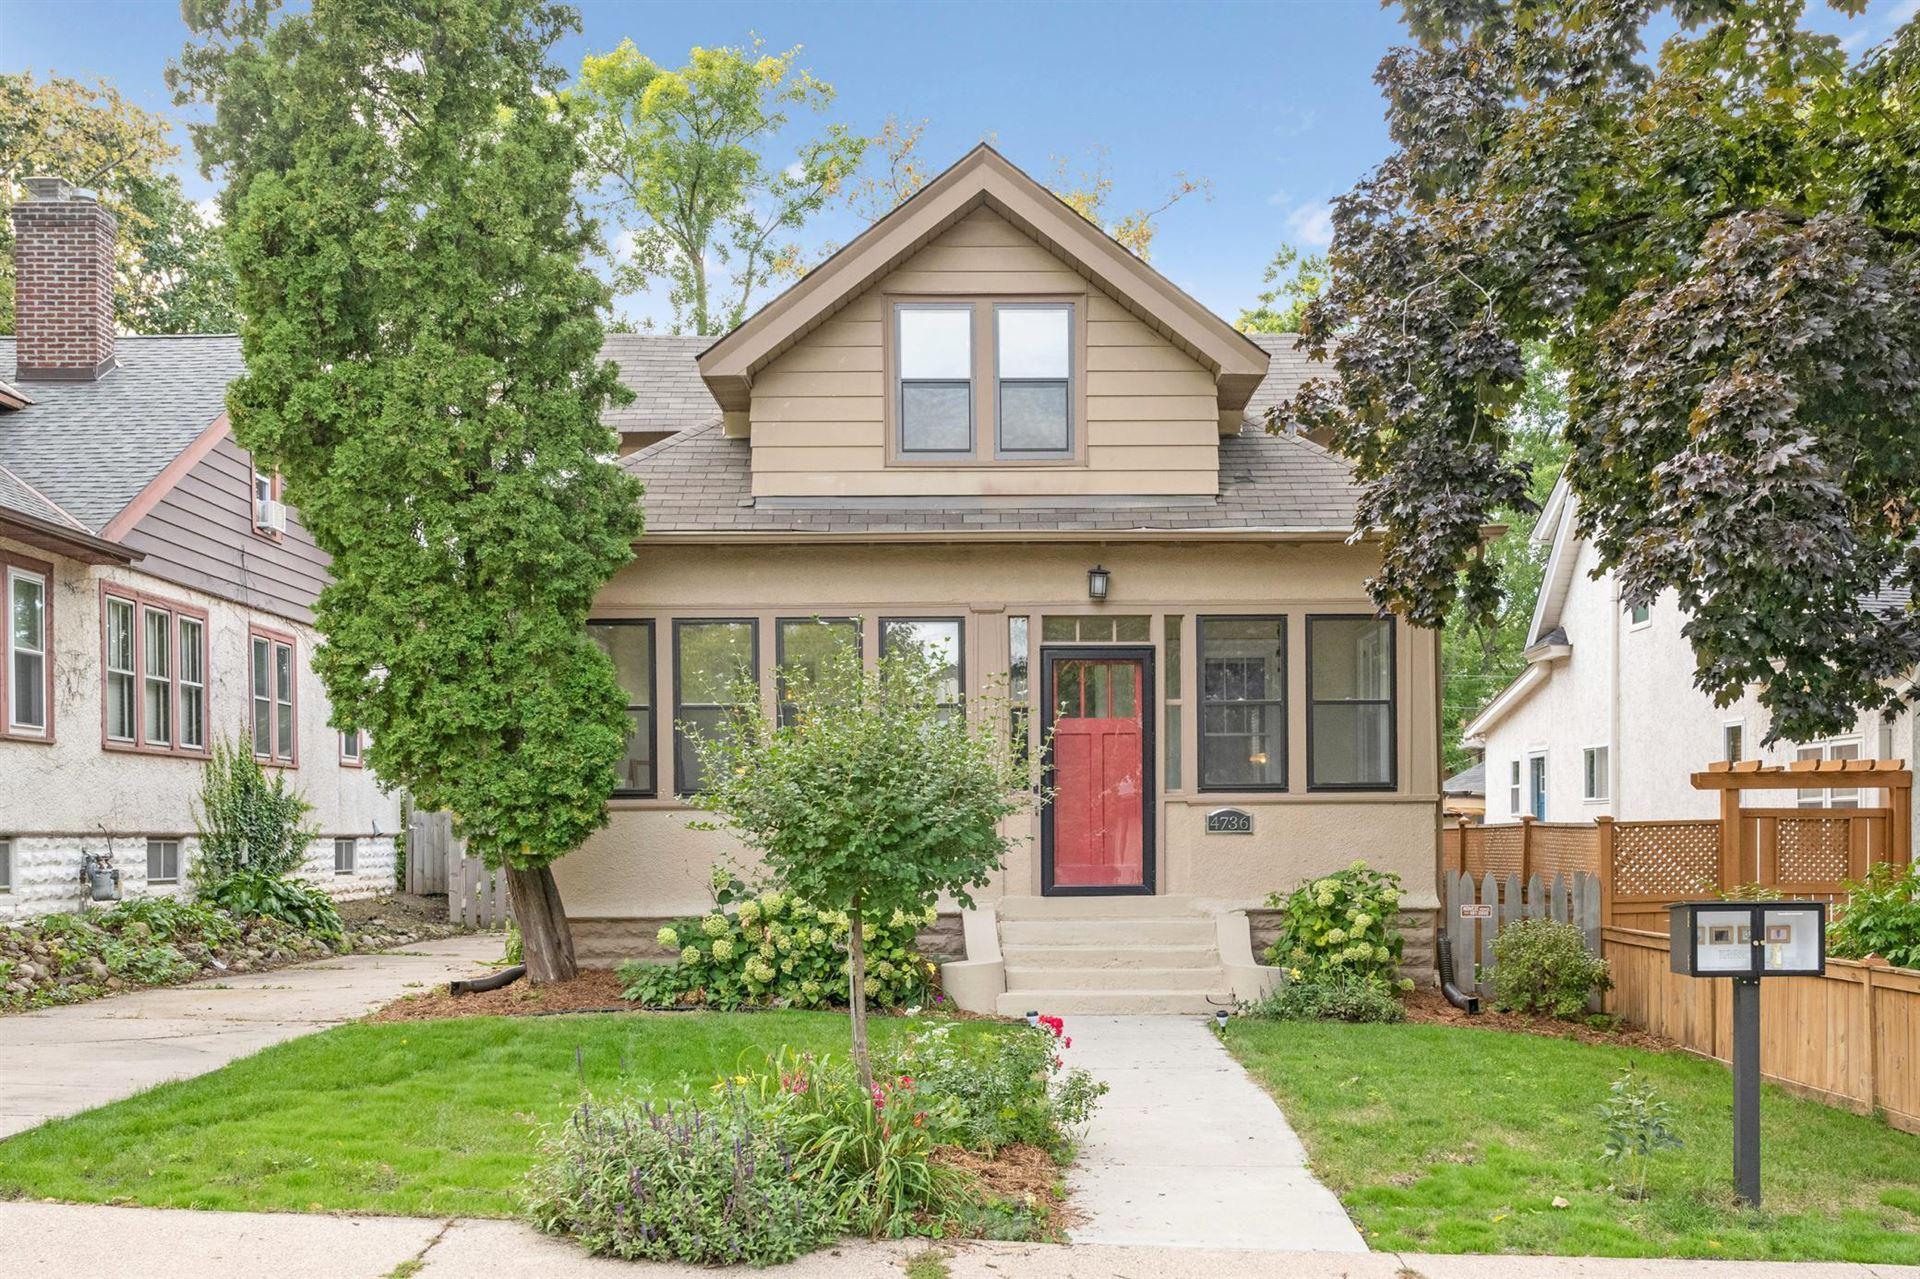 Photo of 4736 Bryant Avenue S, Minneapolis, MN 55419 (MLS # 6110890)